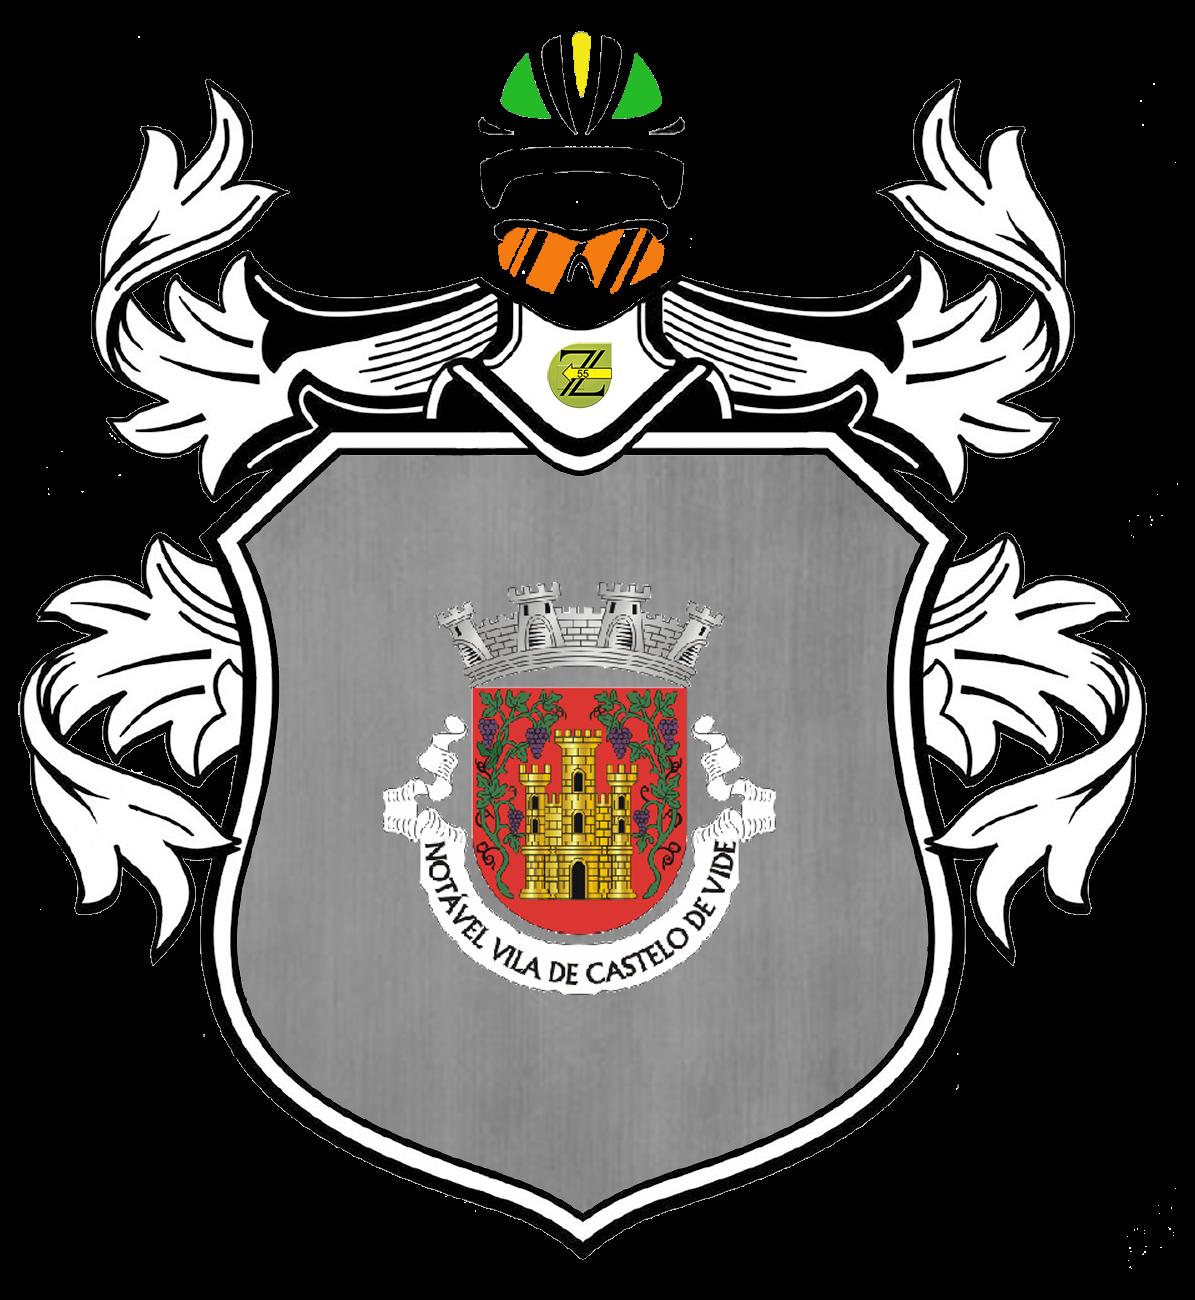 Município de Castelo de Vide